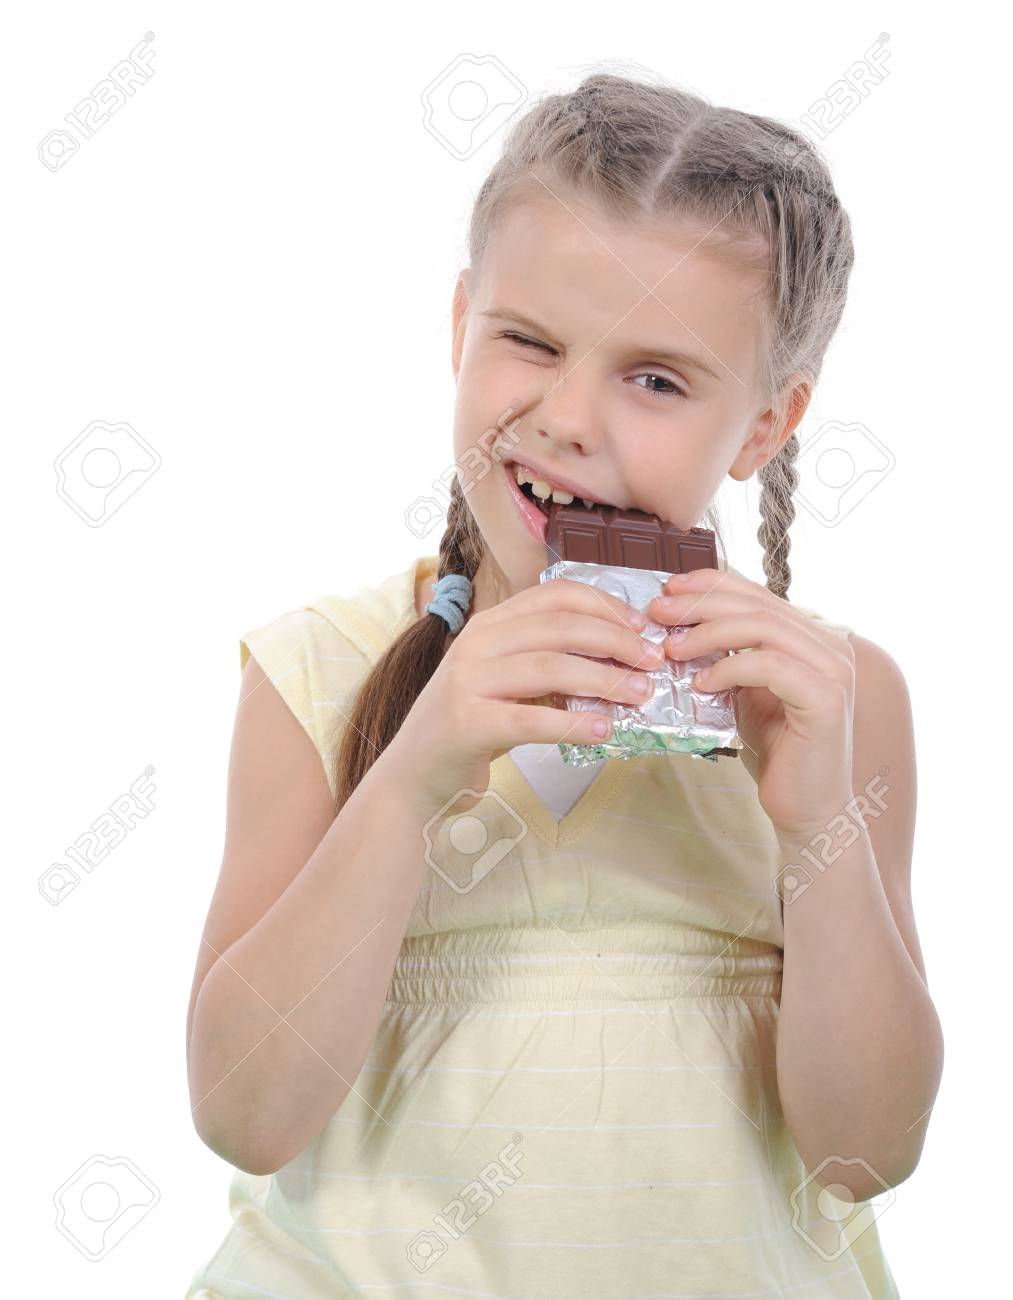 Little girl eating chocolate. Isolated on white background Stock Photo - 7890908